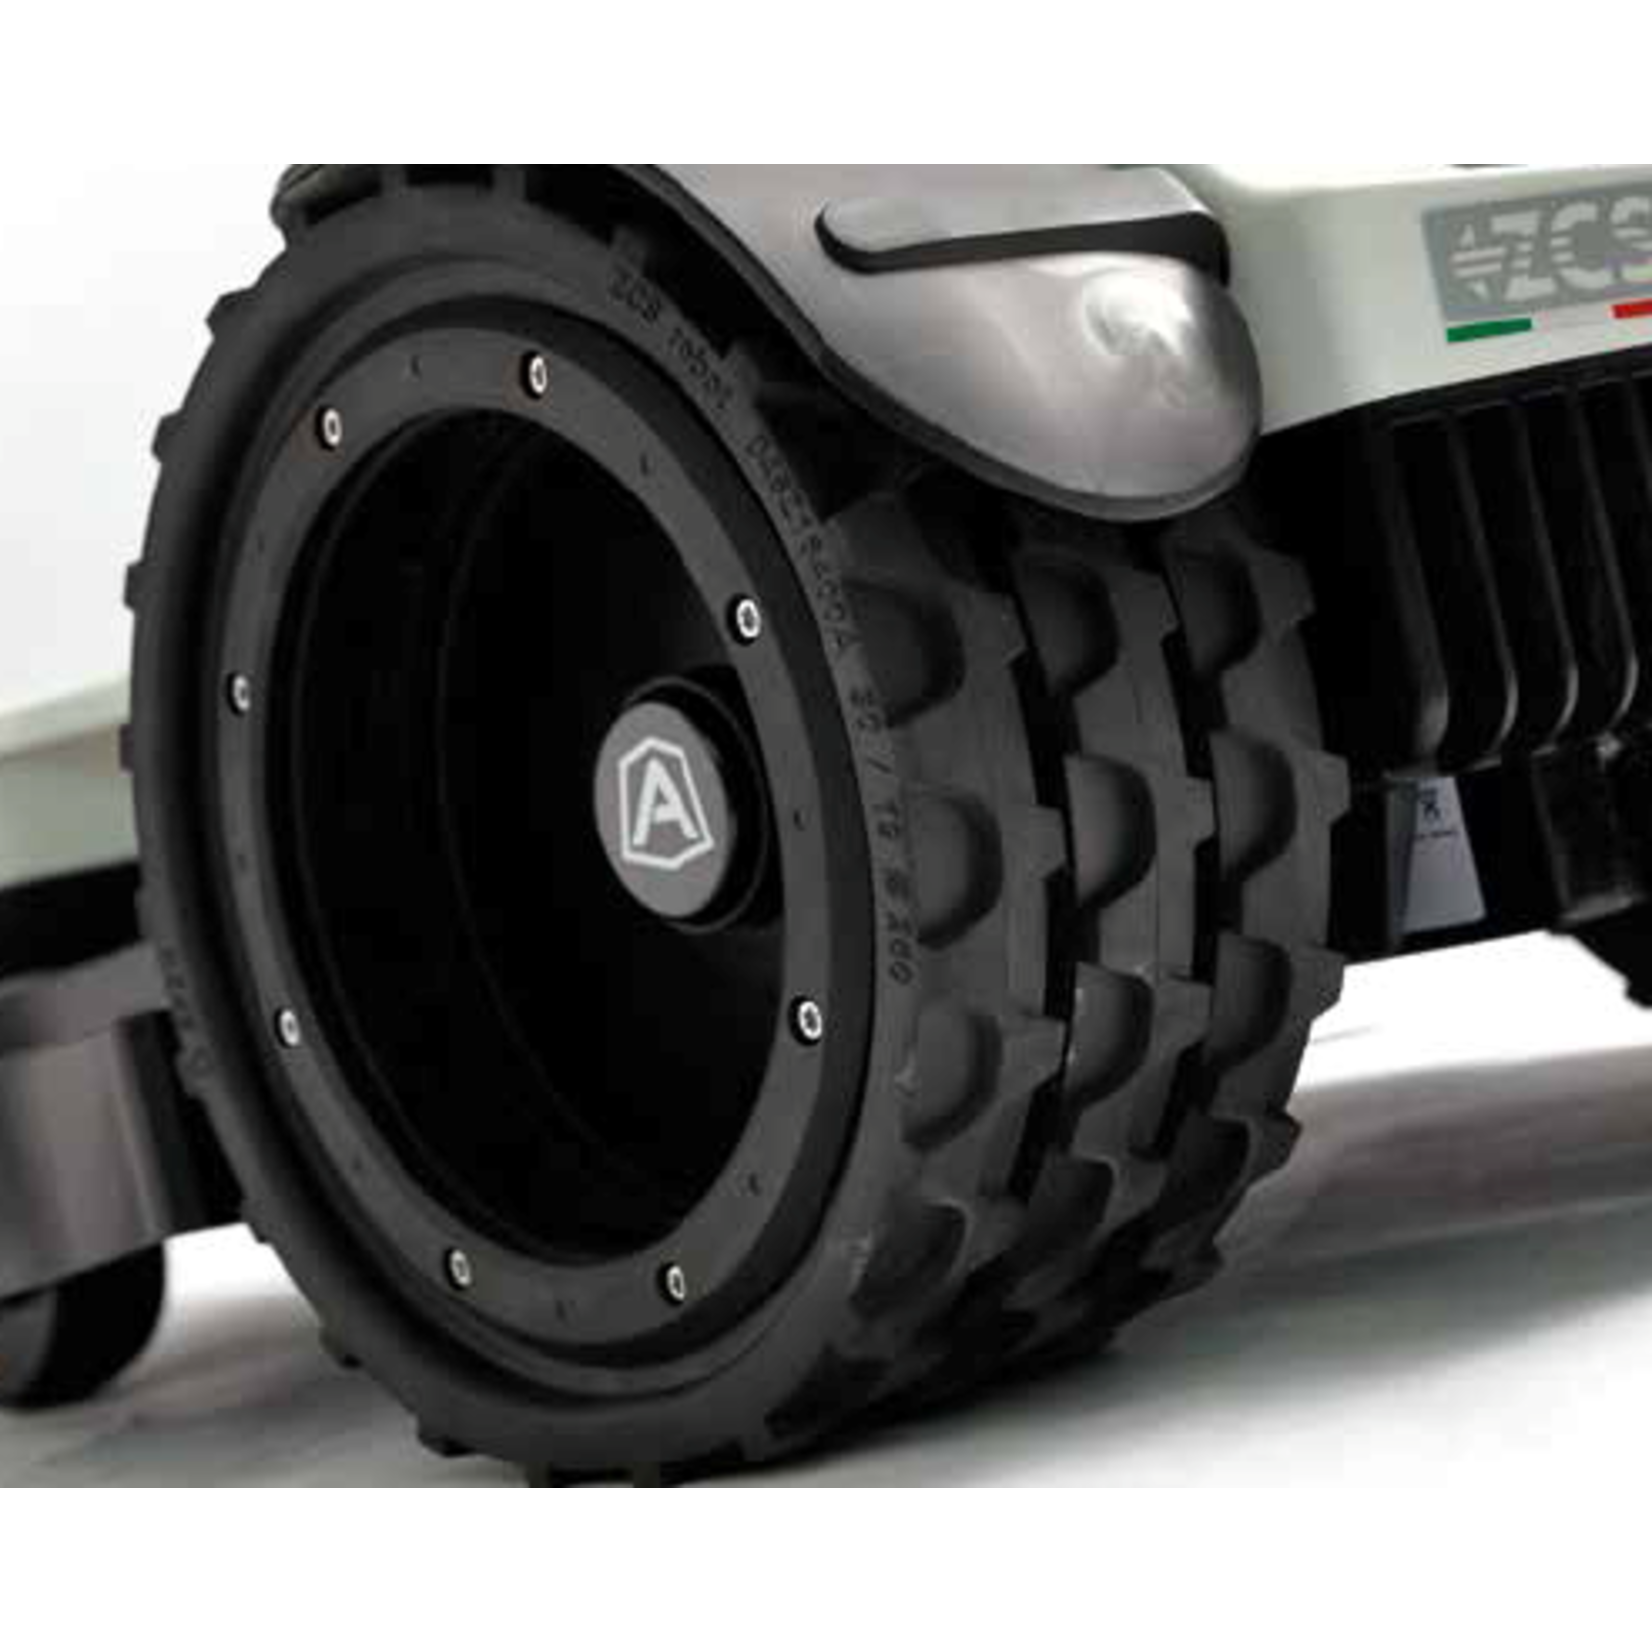 Ambrogio Ambrogio Nextline 4.36 Elite Rasenmähroboter Modell 2021